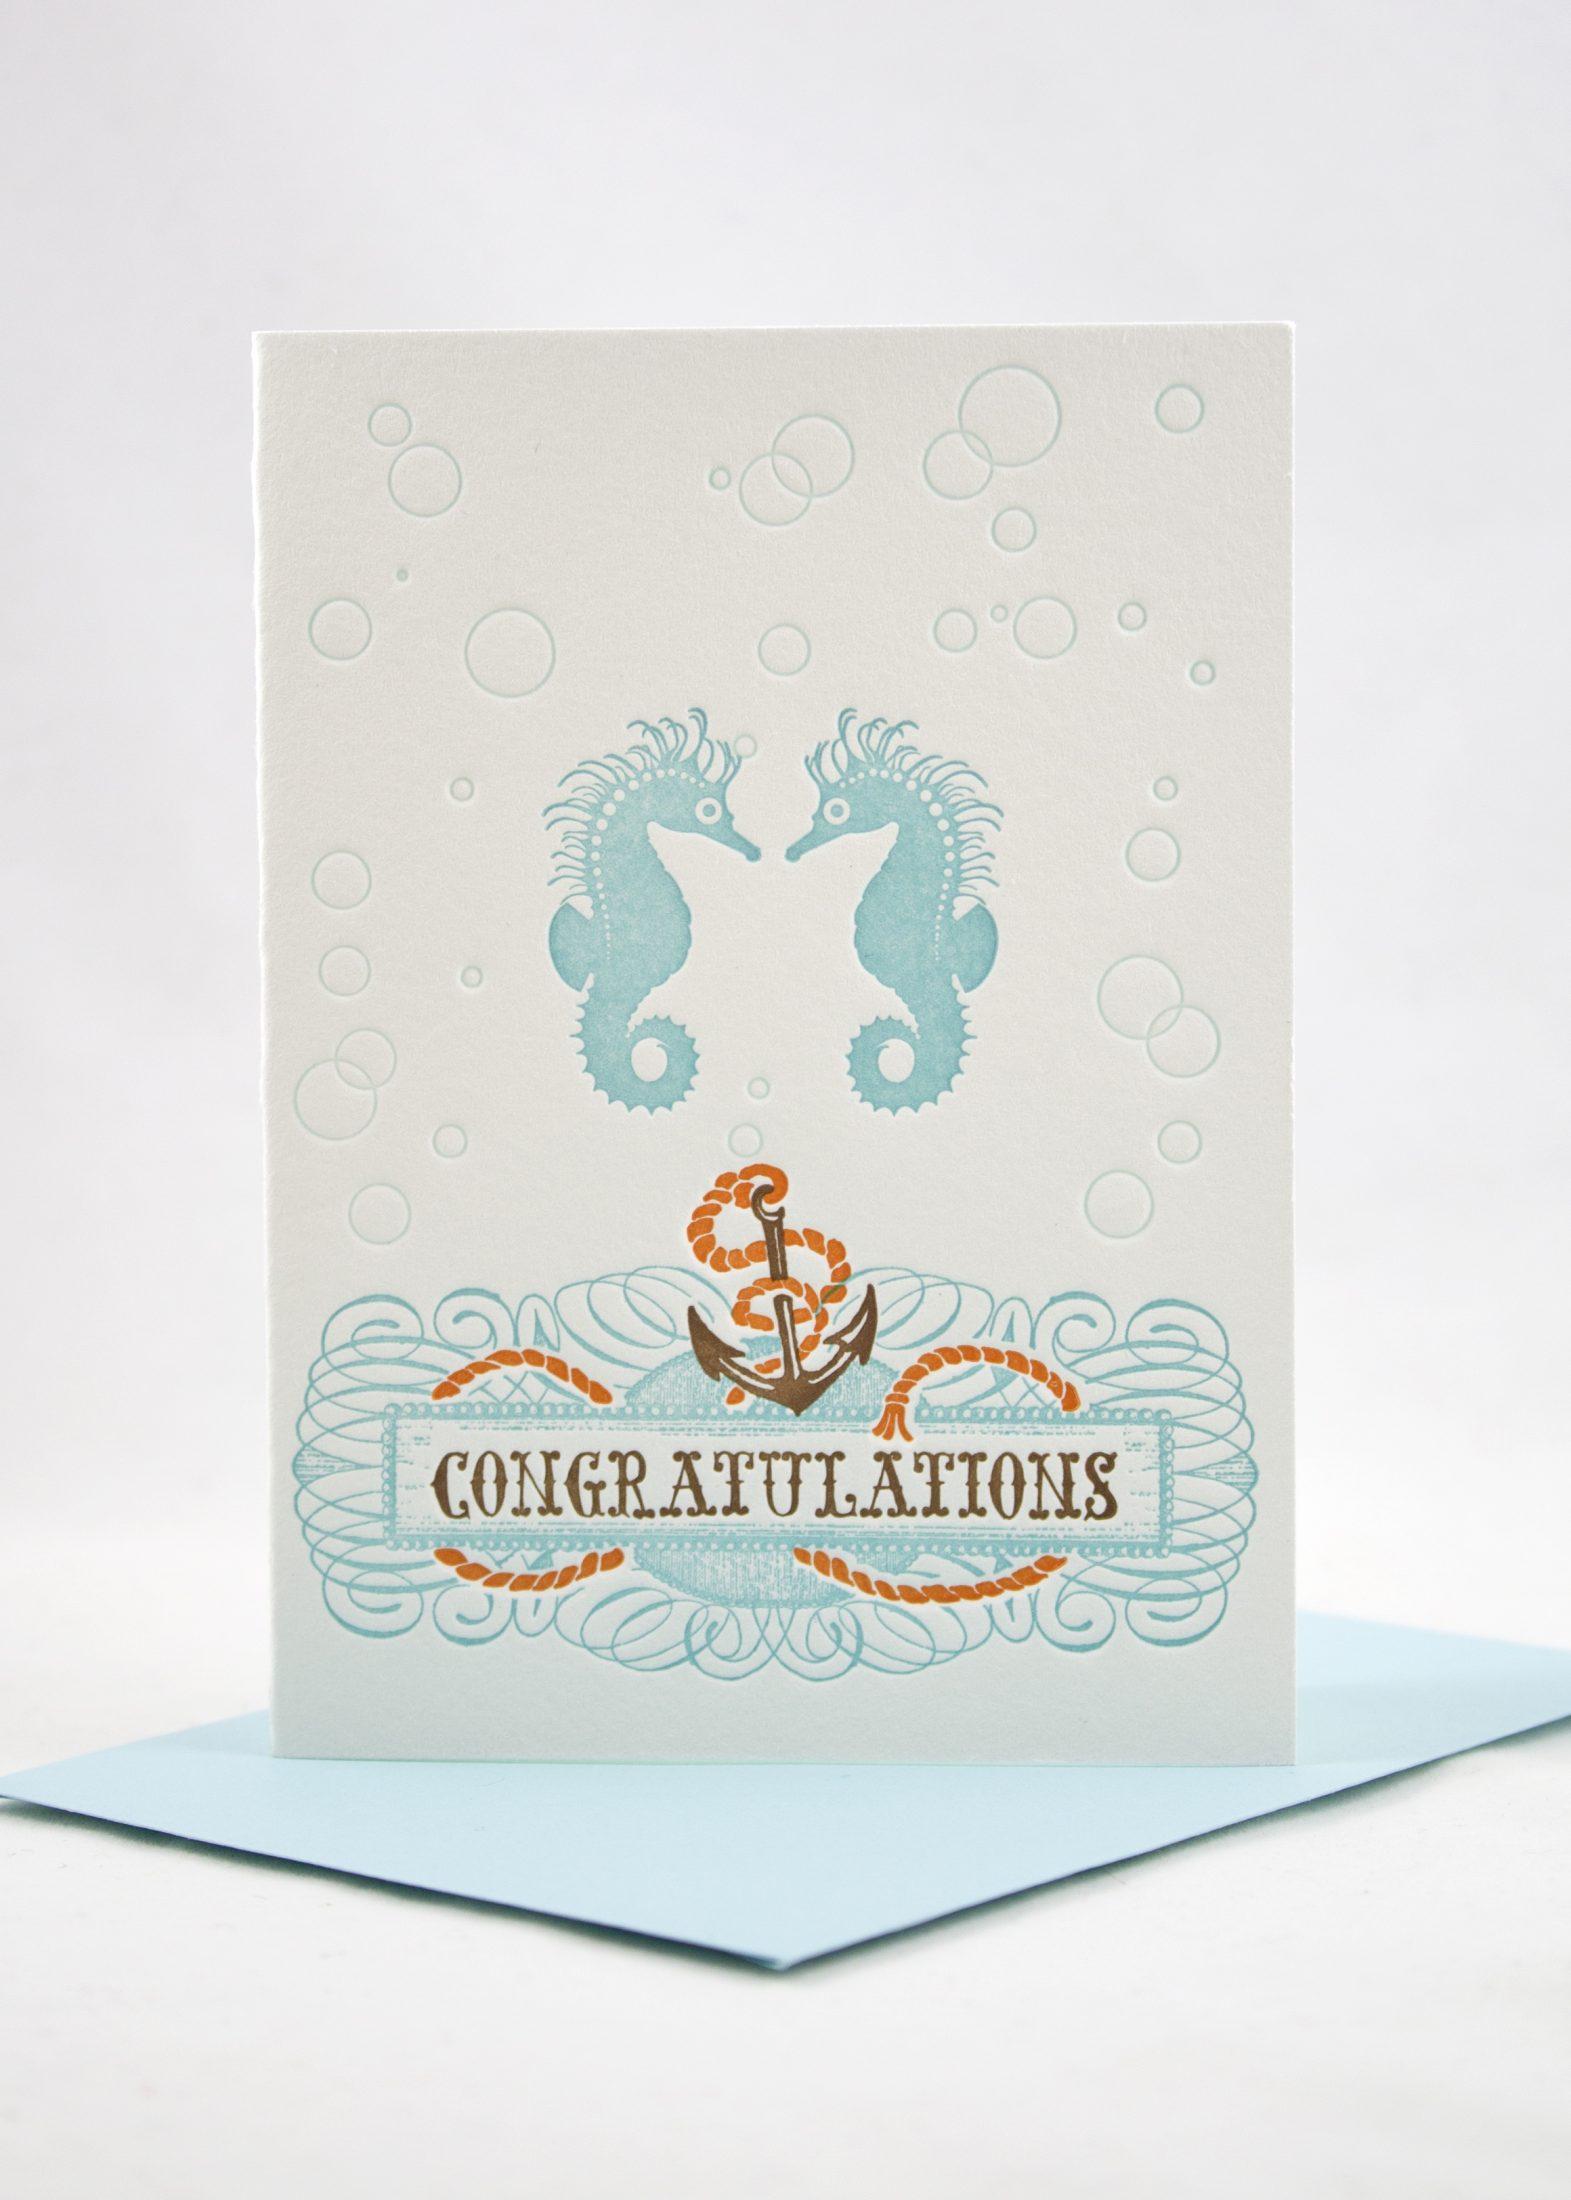 beautiful congrats card